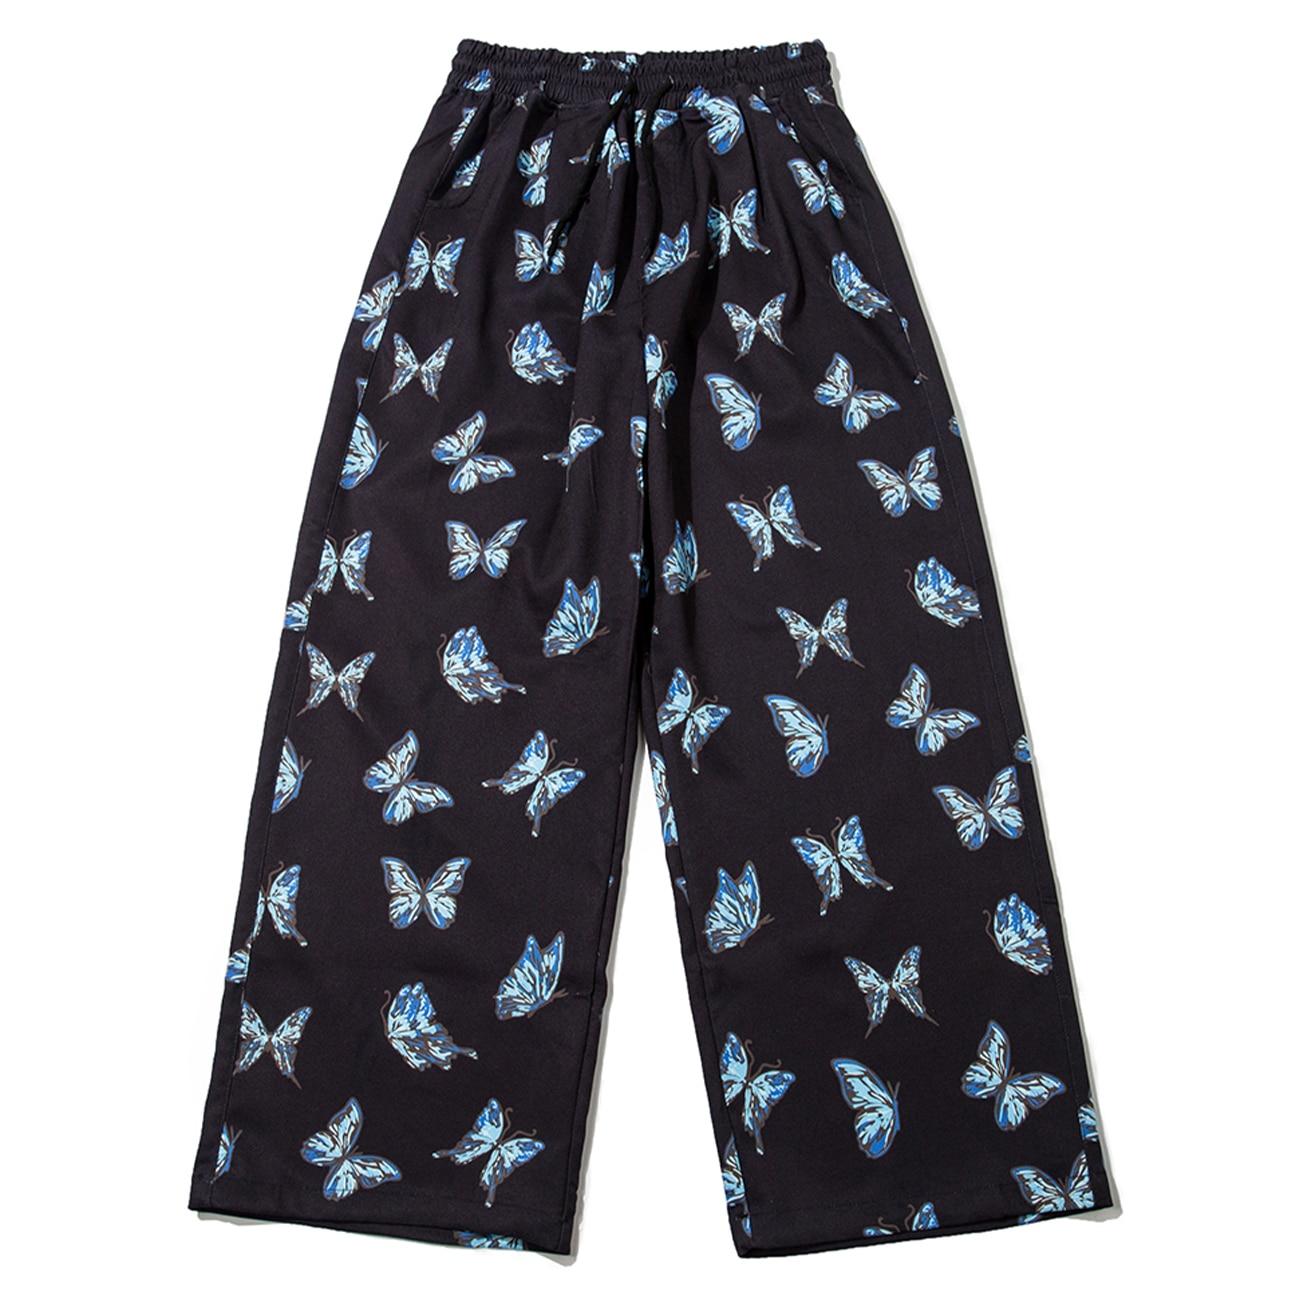 2021 Hip Hop Streetwear Baggy Harem Running Pants Tapered Casual Butterfly Print Sweatpants Harajuku  Joggers Men's Trousers